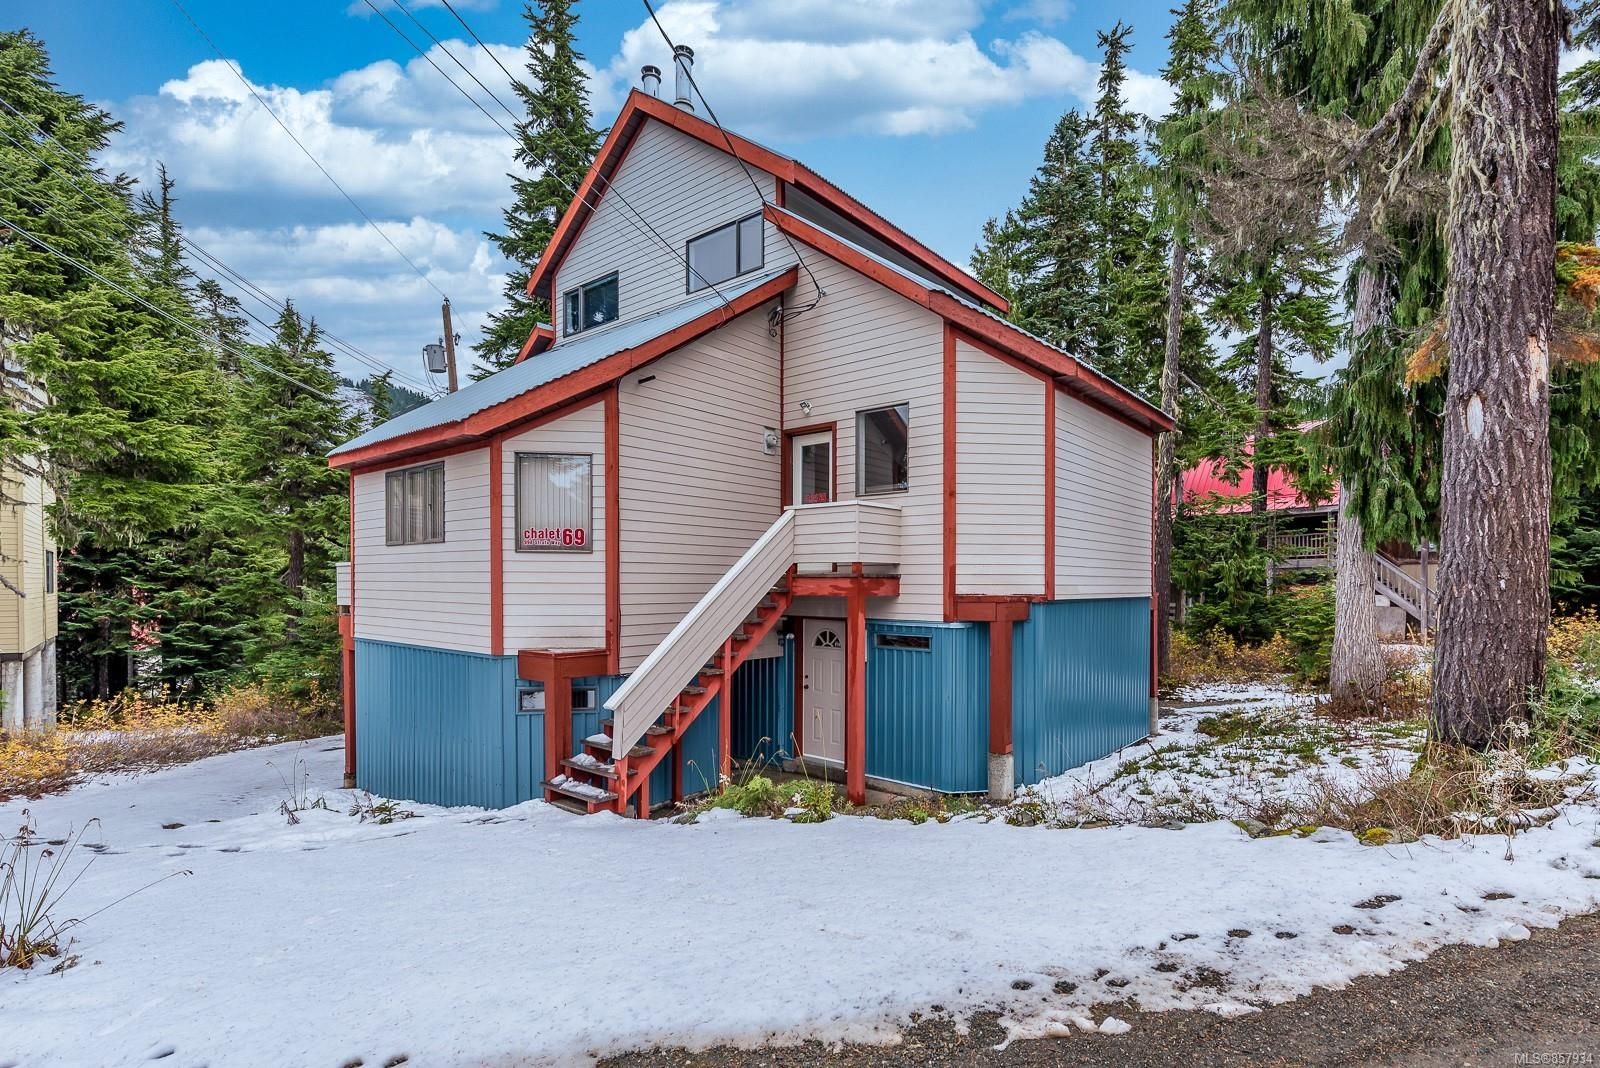 Photo 29: Photos: 998 STRATA Way in : CV Mt Washington House for sale (Comox Valley)  : MLS®# 857934